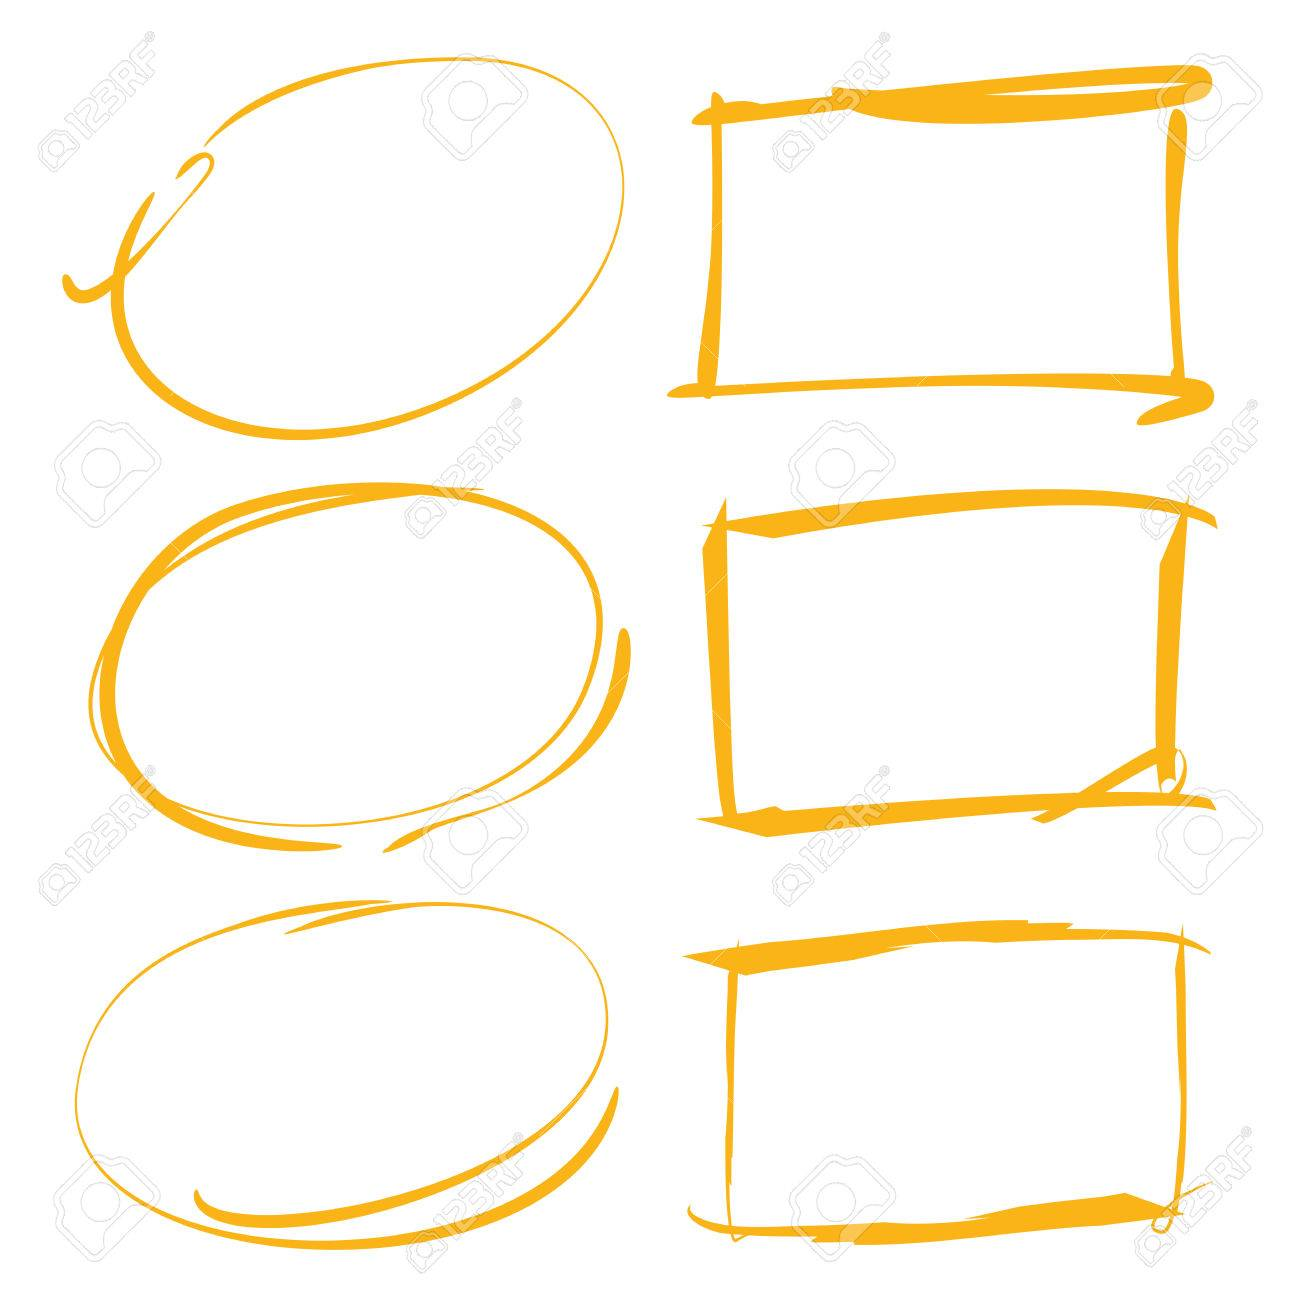 Yellow Hand Drawn Rectangle Frames, Circles Royalty Free Cliparts ...